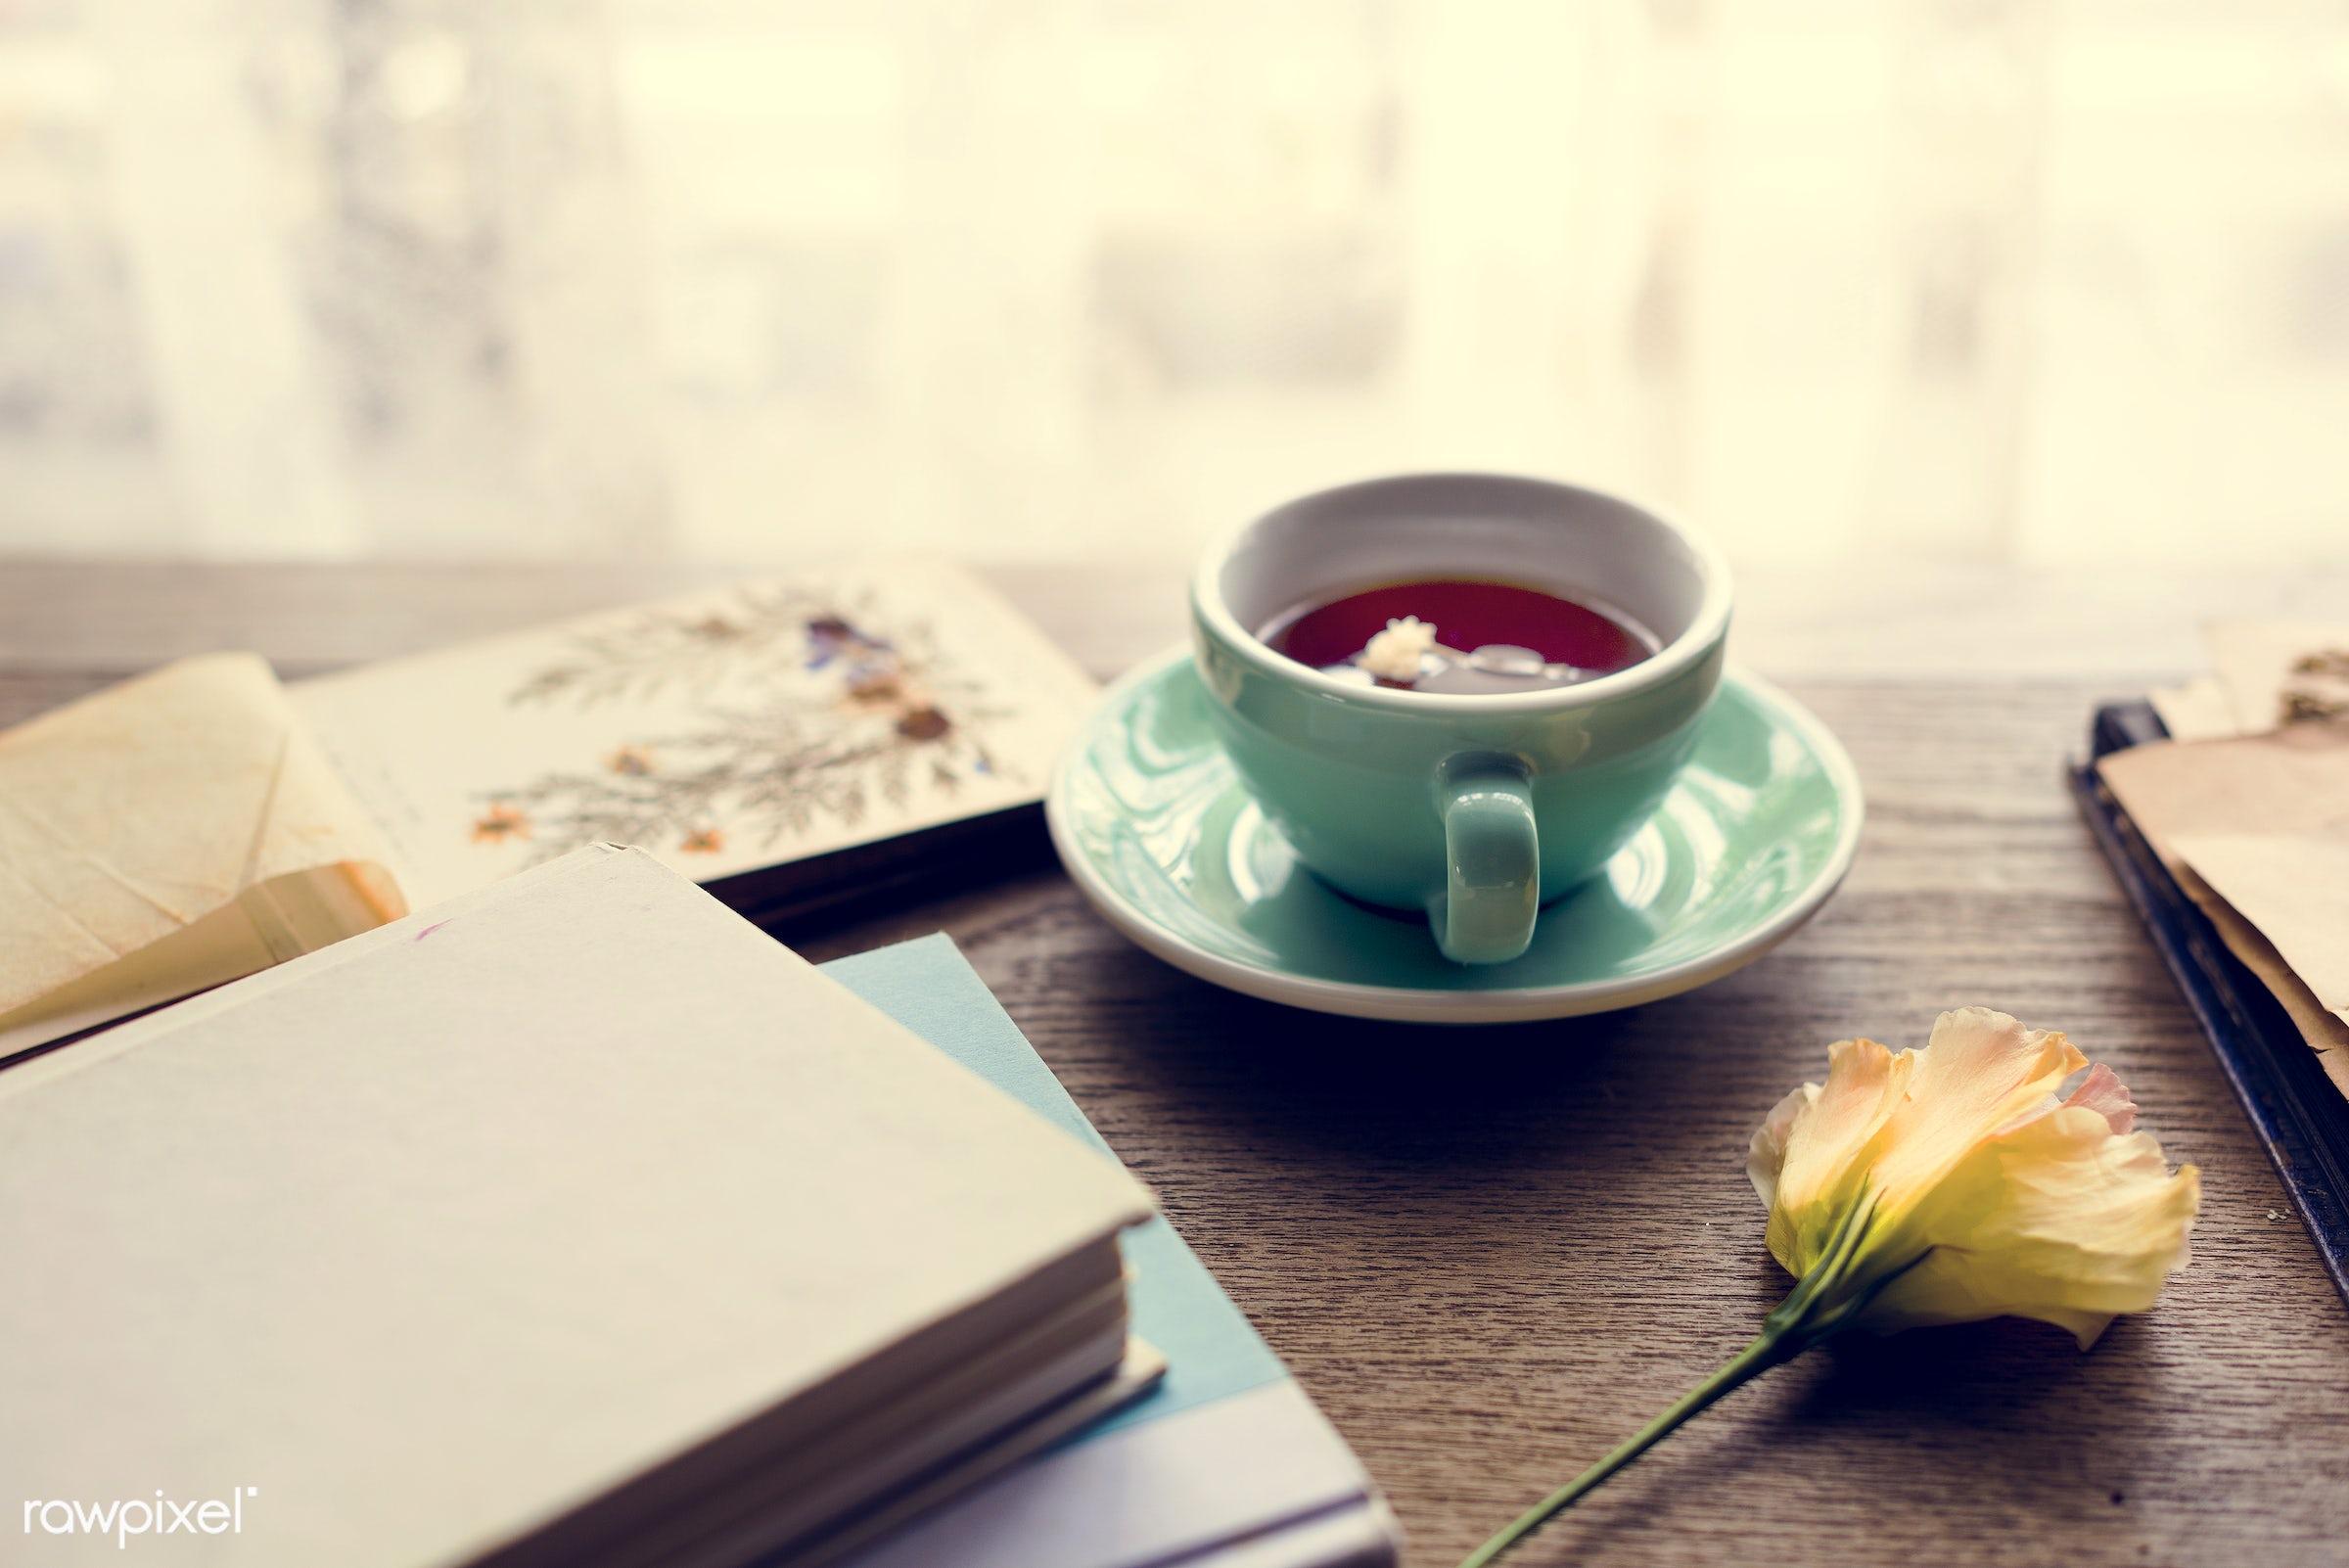 cup, nobody, detail, relax, tea, break, nature, drink, flowers, cheerful, flower, coffee, refreshment, leisure, floristics,...